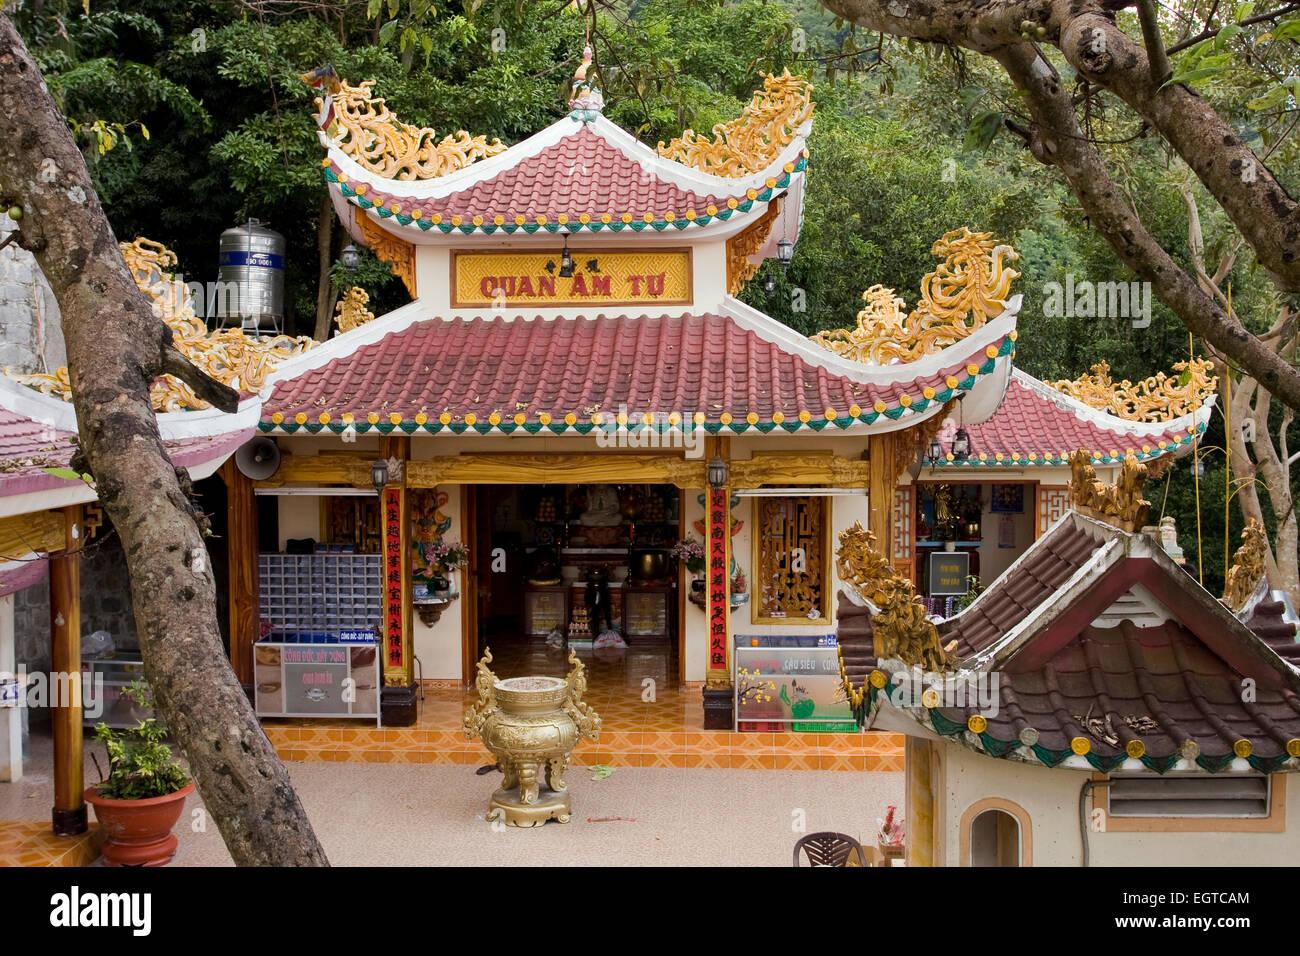 Cao Dai Temple Pagoda at Tay Ninh, Vietnam, Southeast Asia - Stock Image